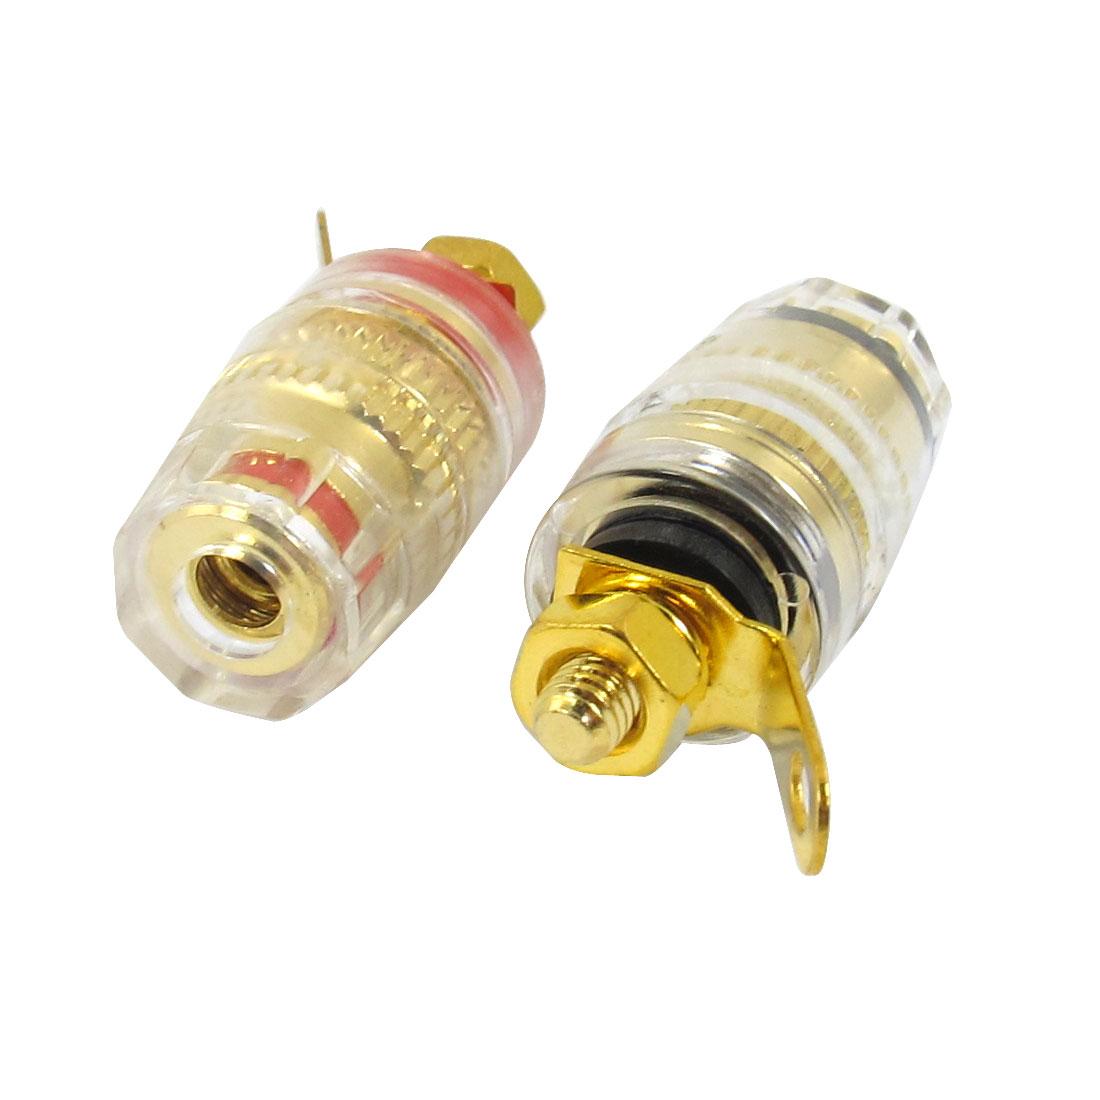 2Pcs Banana Socket Female Nut Knurl Screw Jack Connector Gold Tone